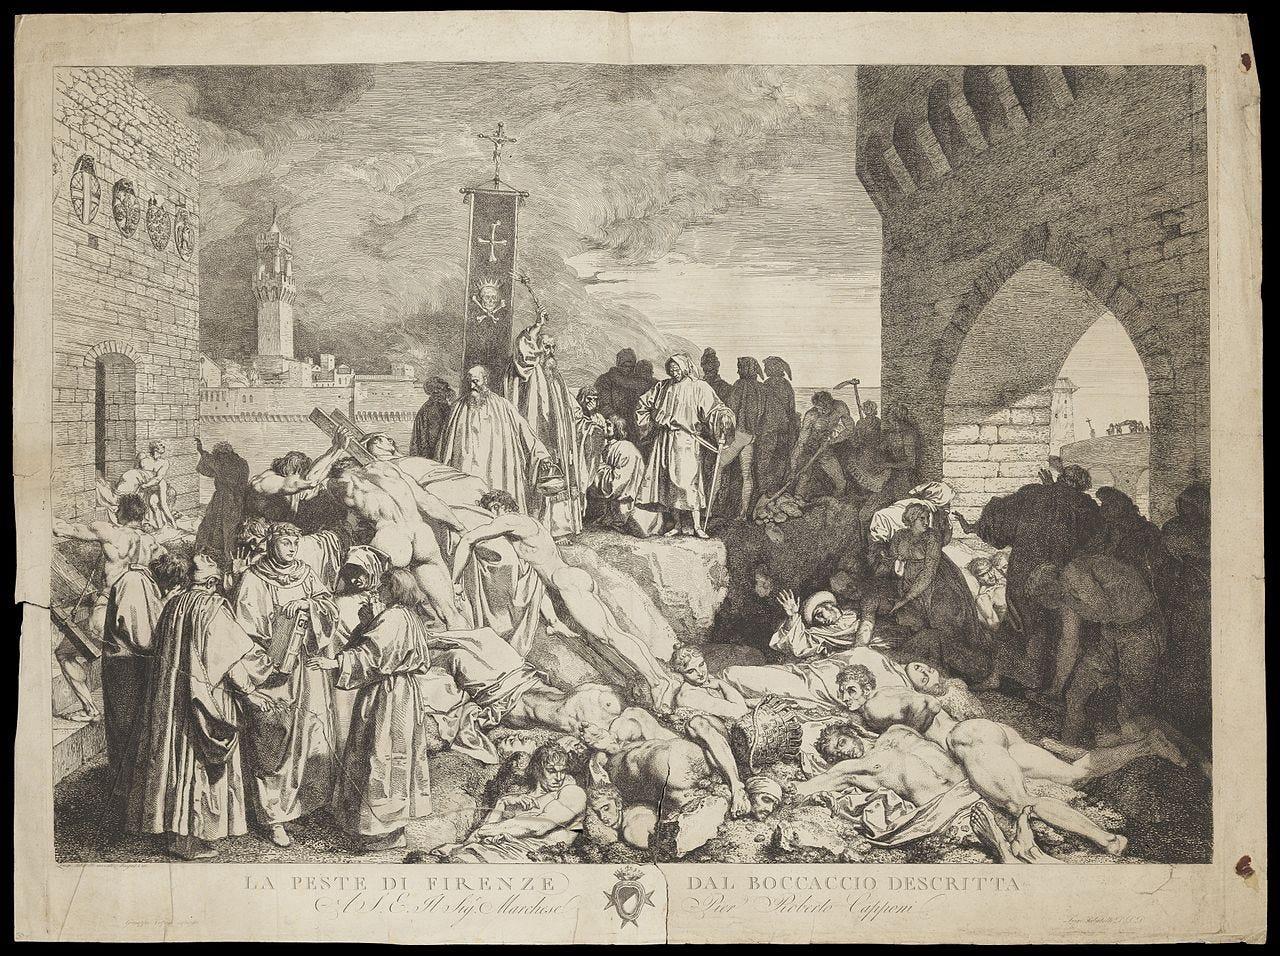 La Pestilenza: The Black Death in Italy - The History Buff - Medium